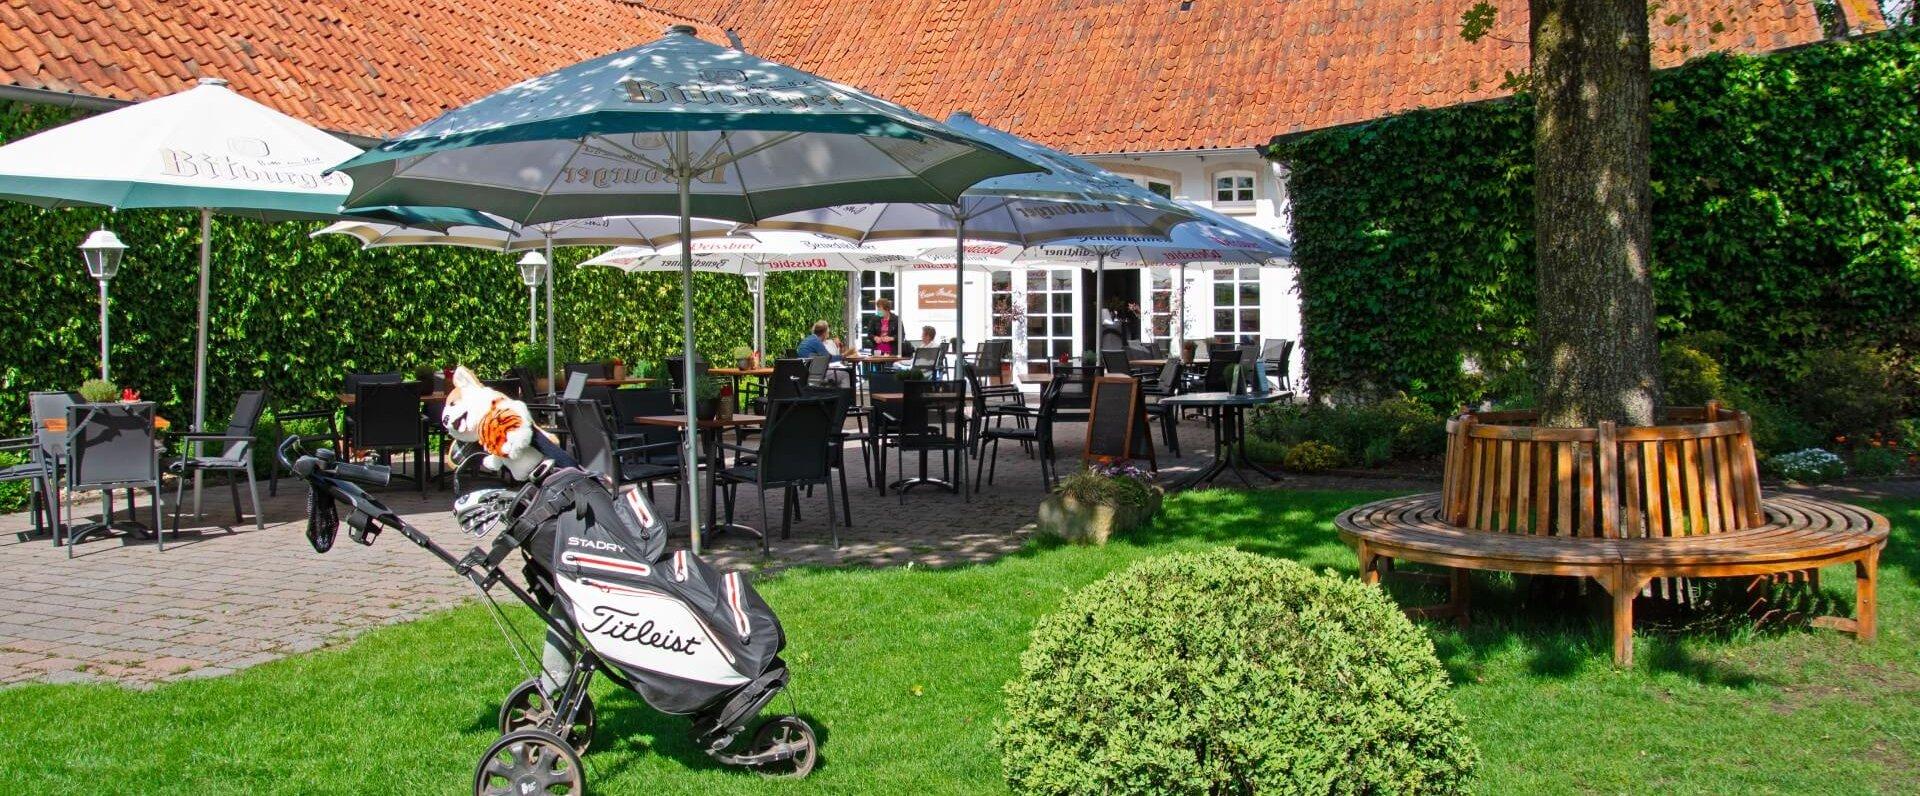 https://golfclub-peckeloh.de/wp-content/uploads/2021/05/DSC_6761_Terras-1-e1622402641151.jpg